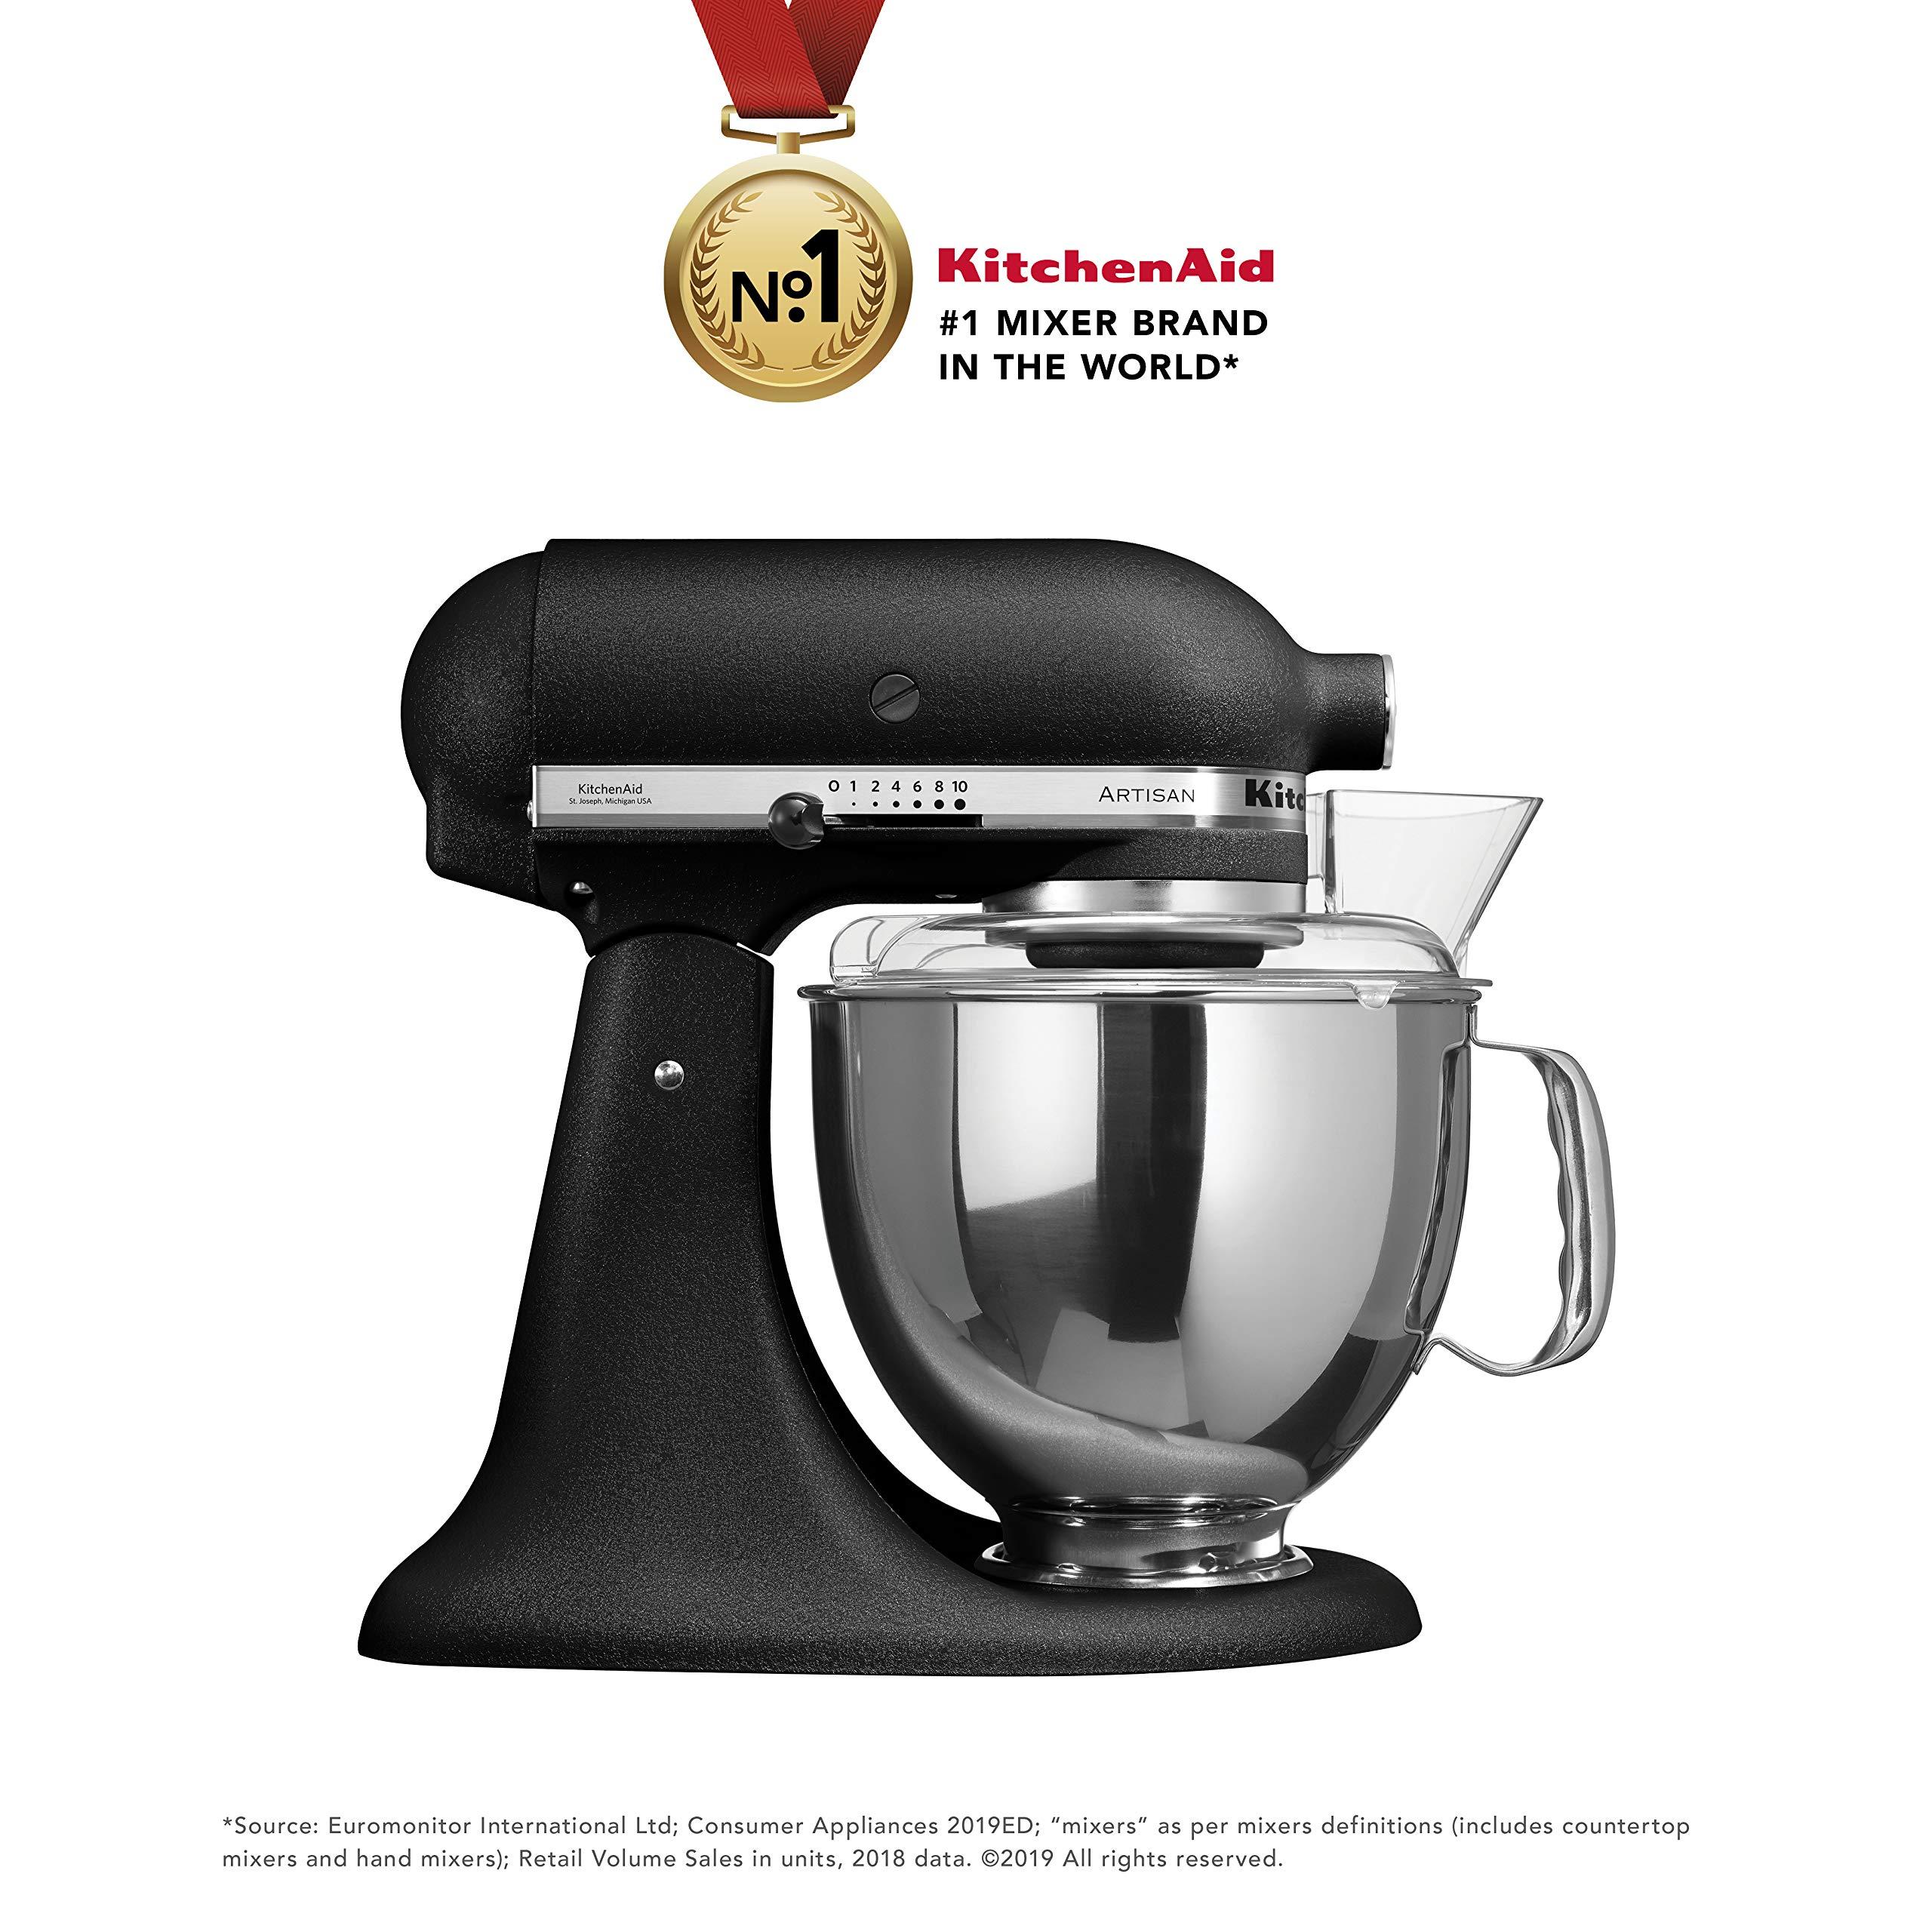 Kitchenaid Artisan Series 5ksm150psbbk 300 Watt Tilt Head Stand Mixer 4 8 Litre Imperial Black Buy Online In Dominica At Dominica Desertcart Com Productid 77044029